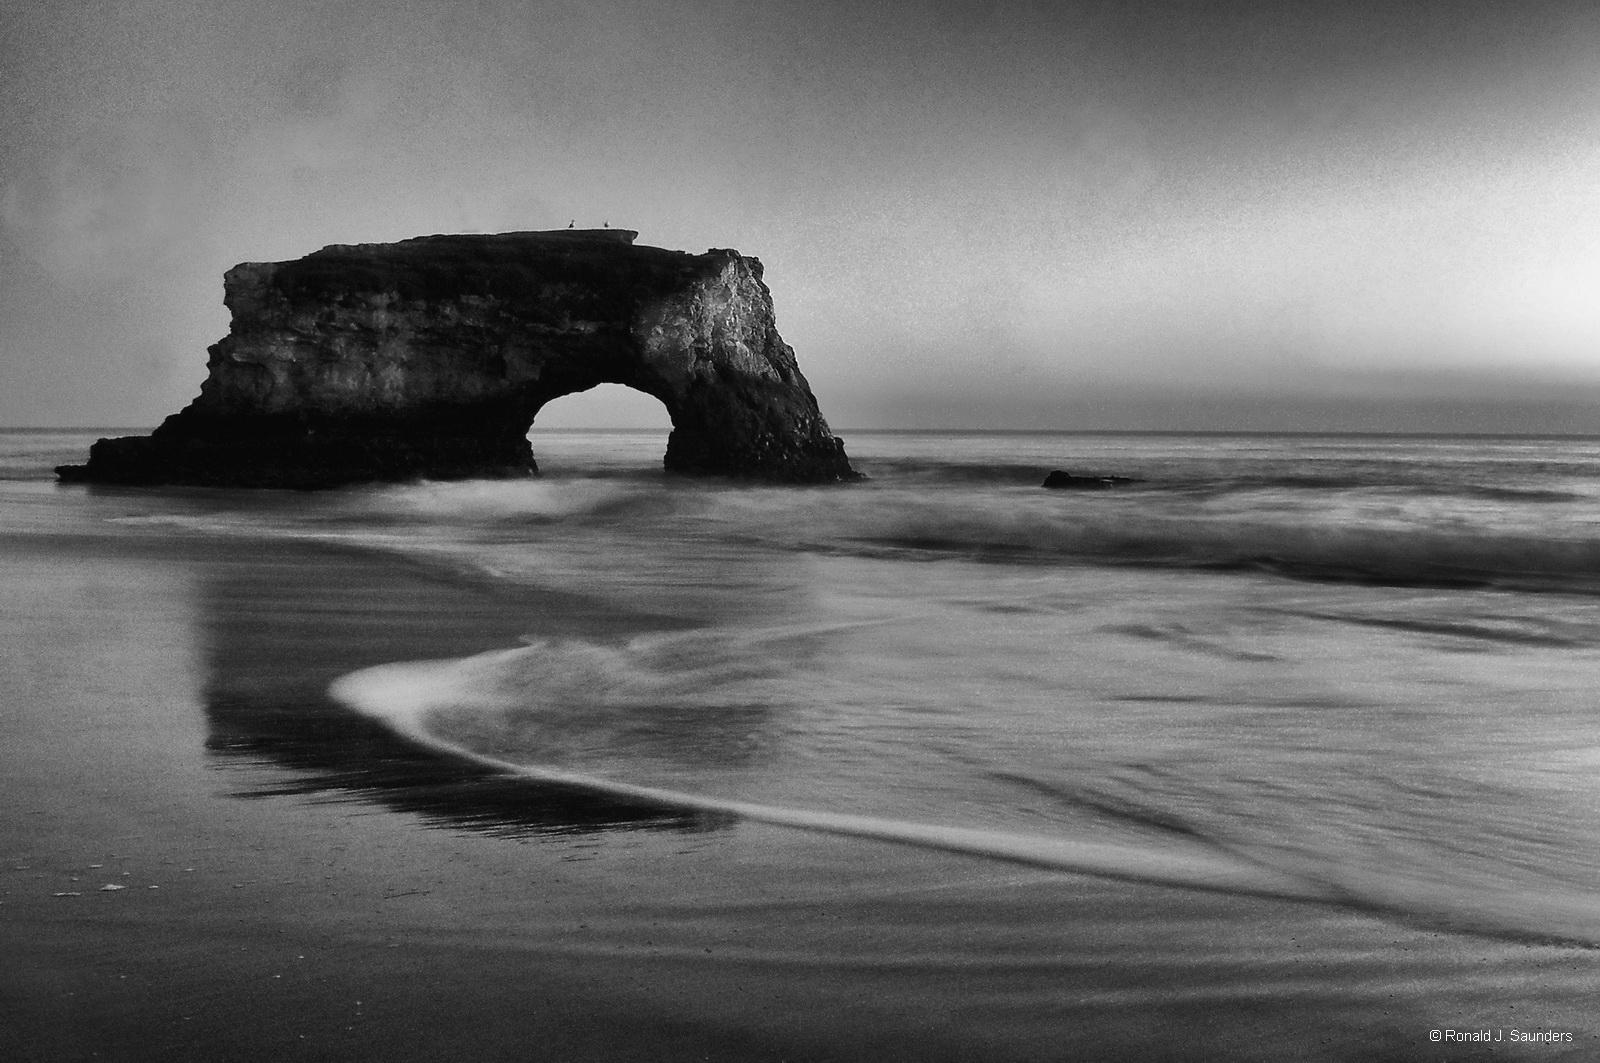 beach, B&W, arch, california, santa cruz, landscape, surf, water, sunsey, photo